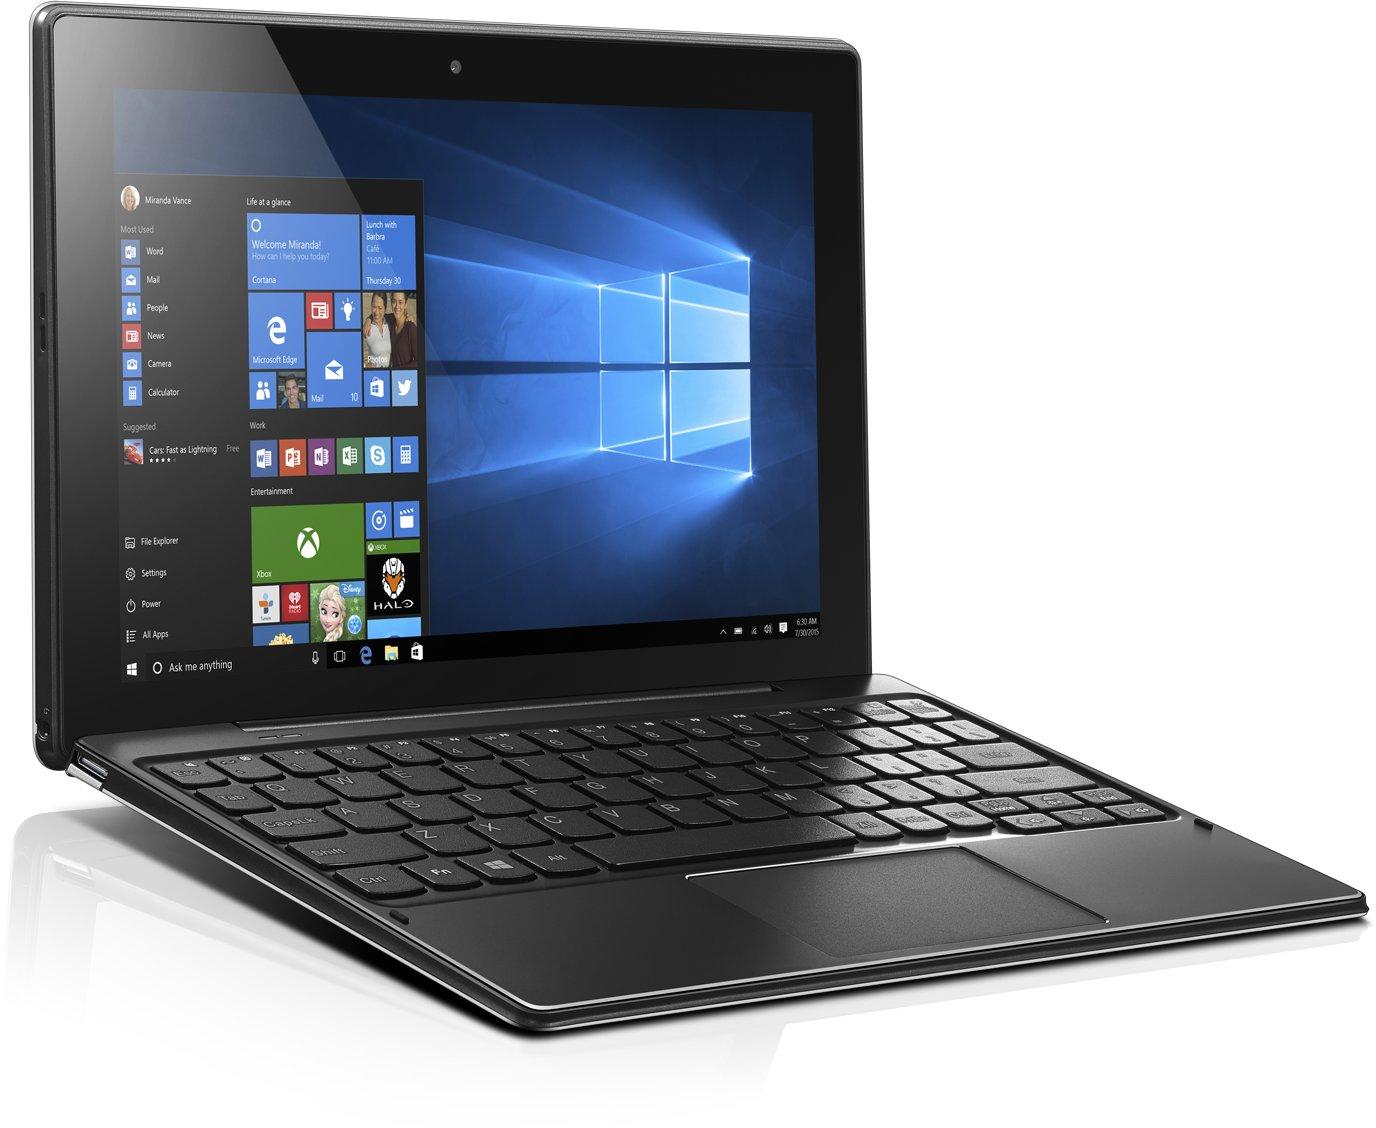 "Lenovo Tablet MiiX 310 Atom x5-Z8350 1,92GHz/2GB/64GB/10,1"" HD/IPS/multitouch/WIFI/KB DOCK/WIN10 červená 80SG00ELCK"